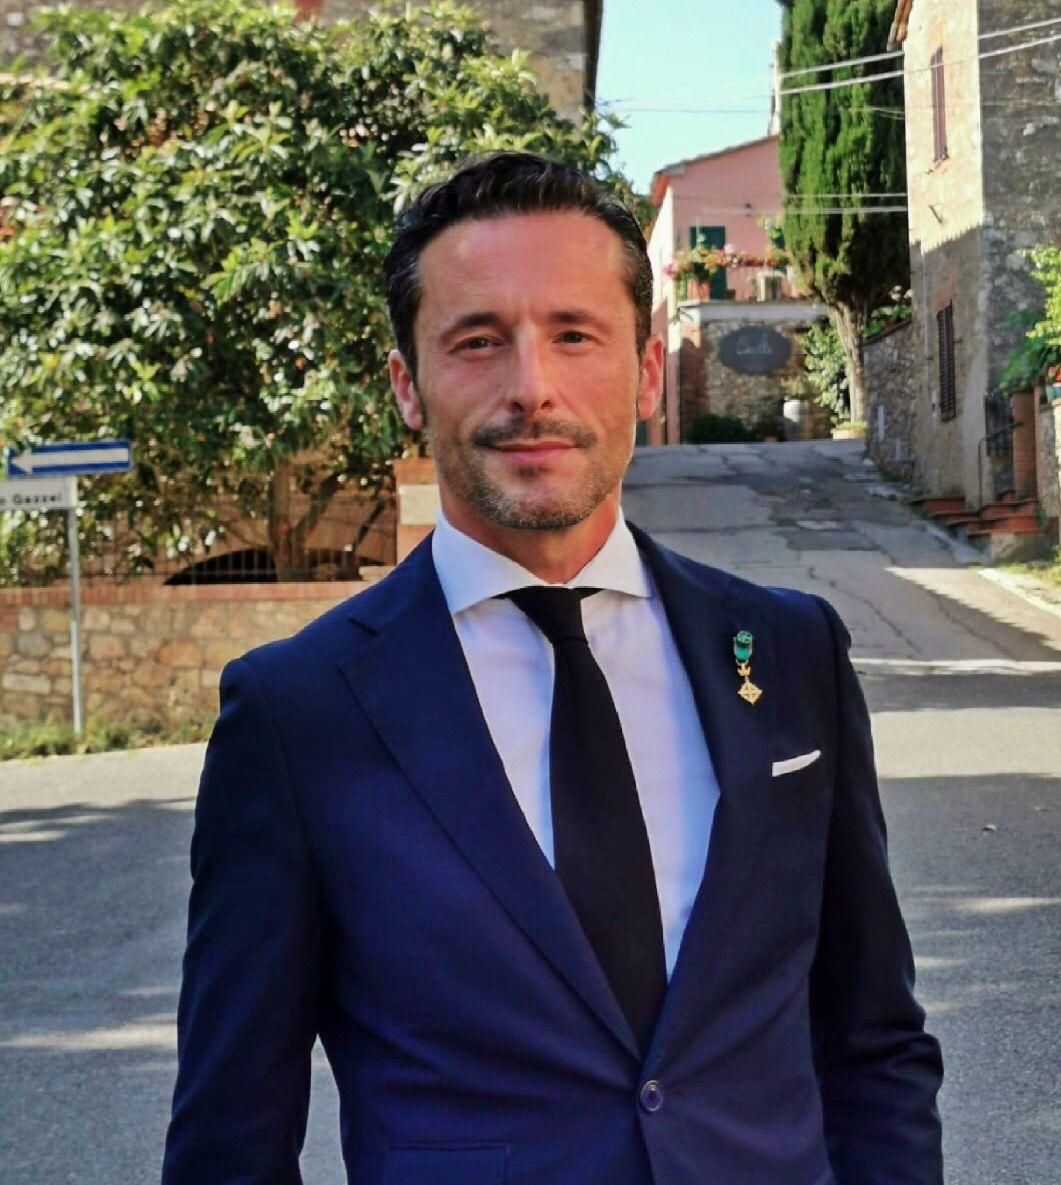 Entrevista a Javier Aguilar, cartelista de Valme de 2021